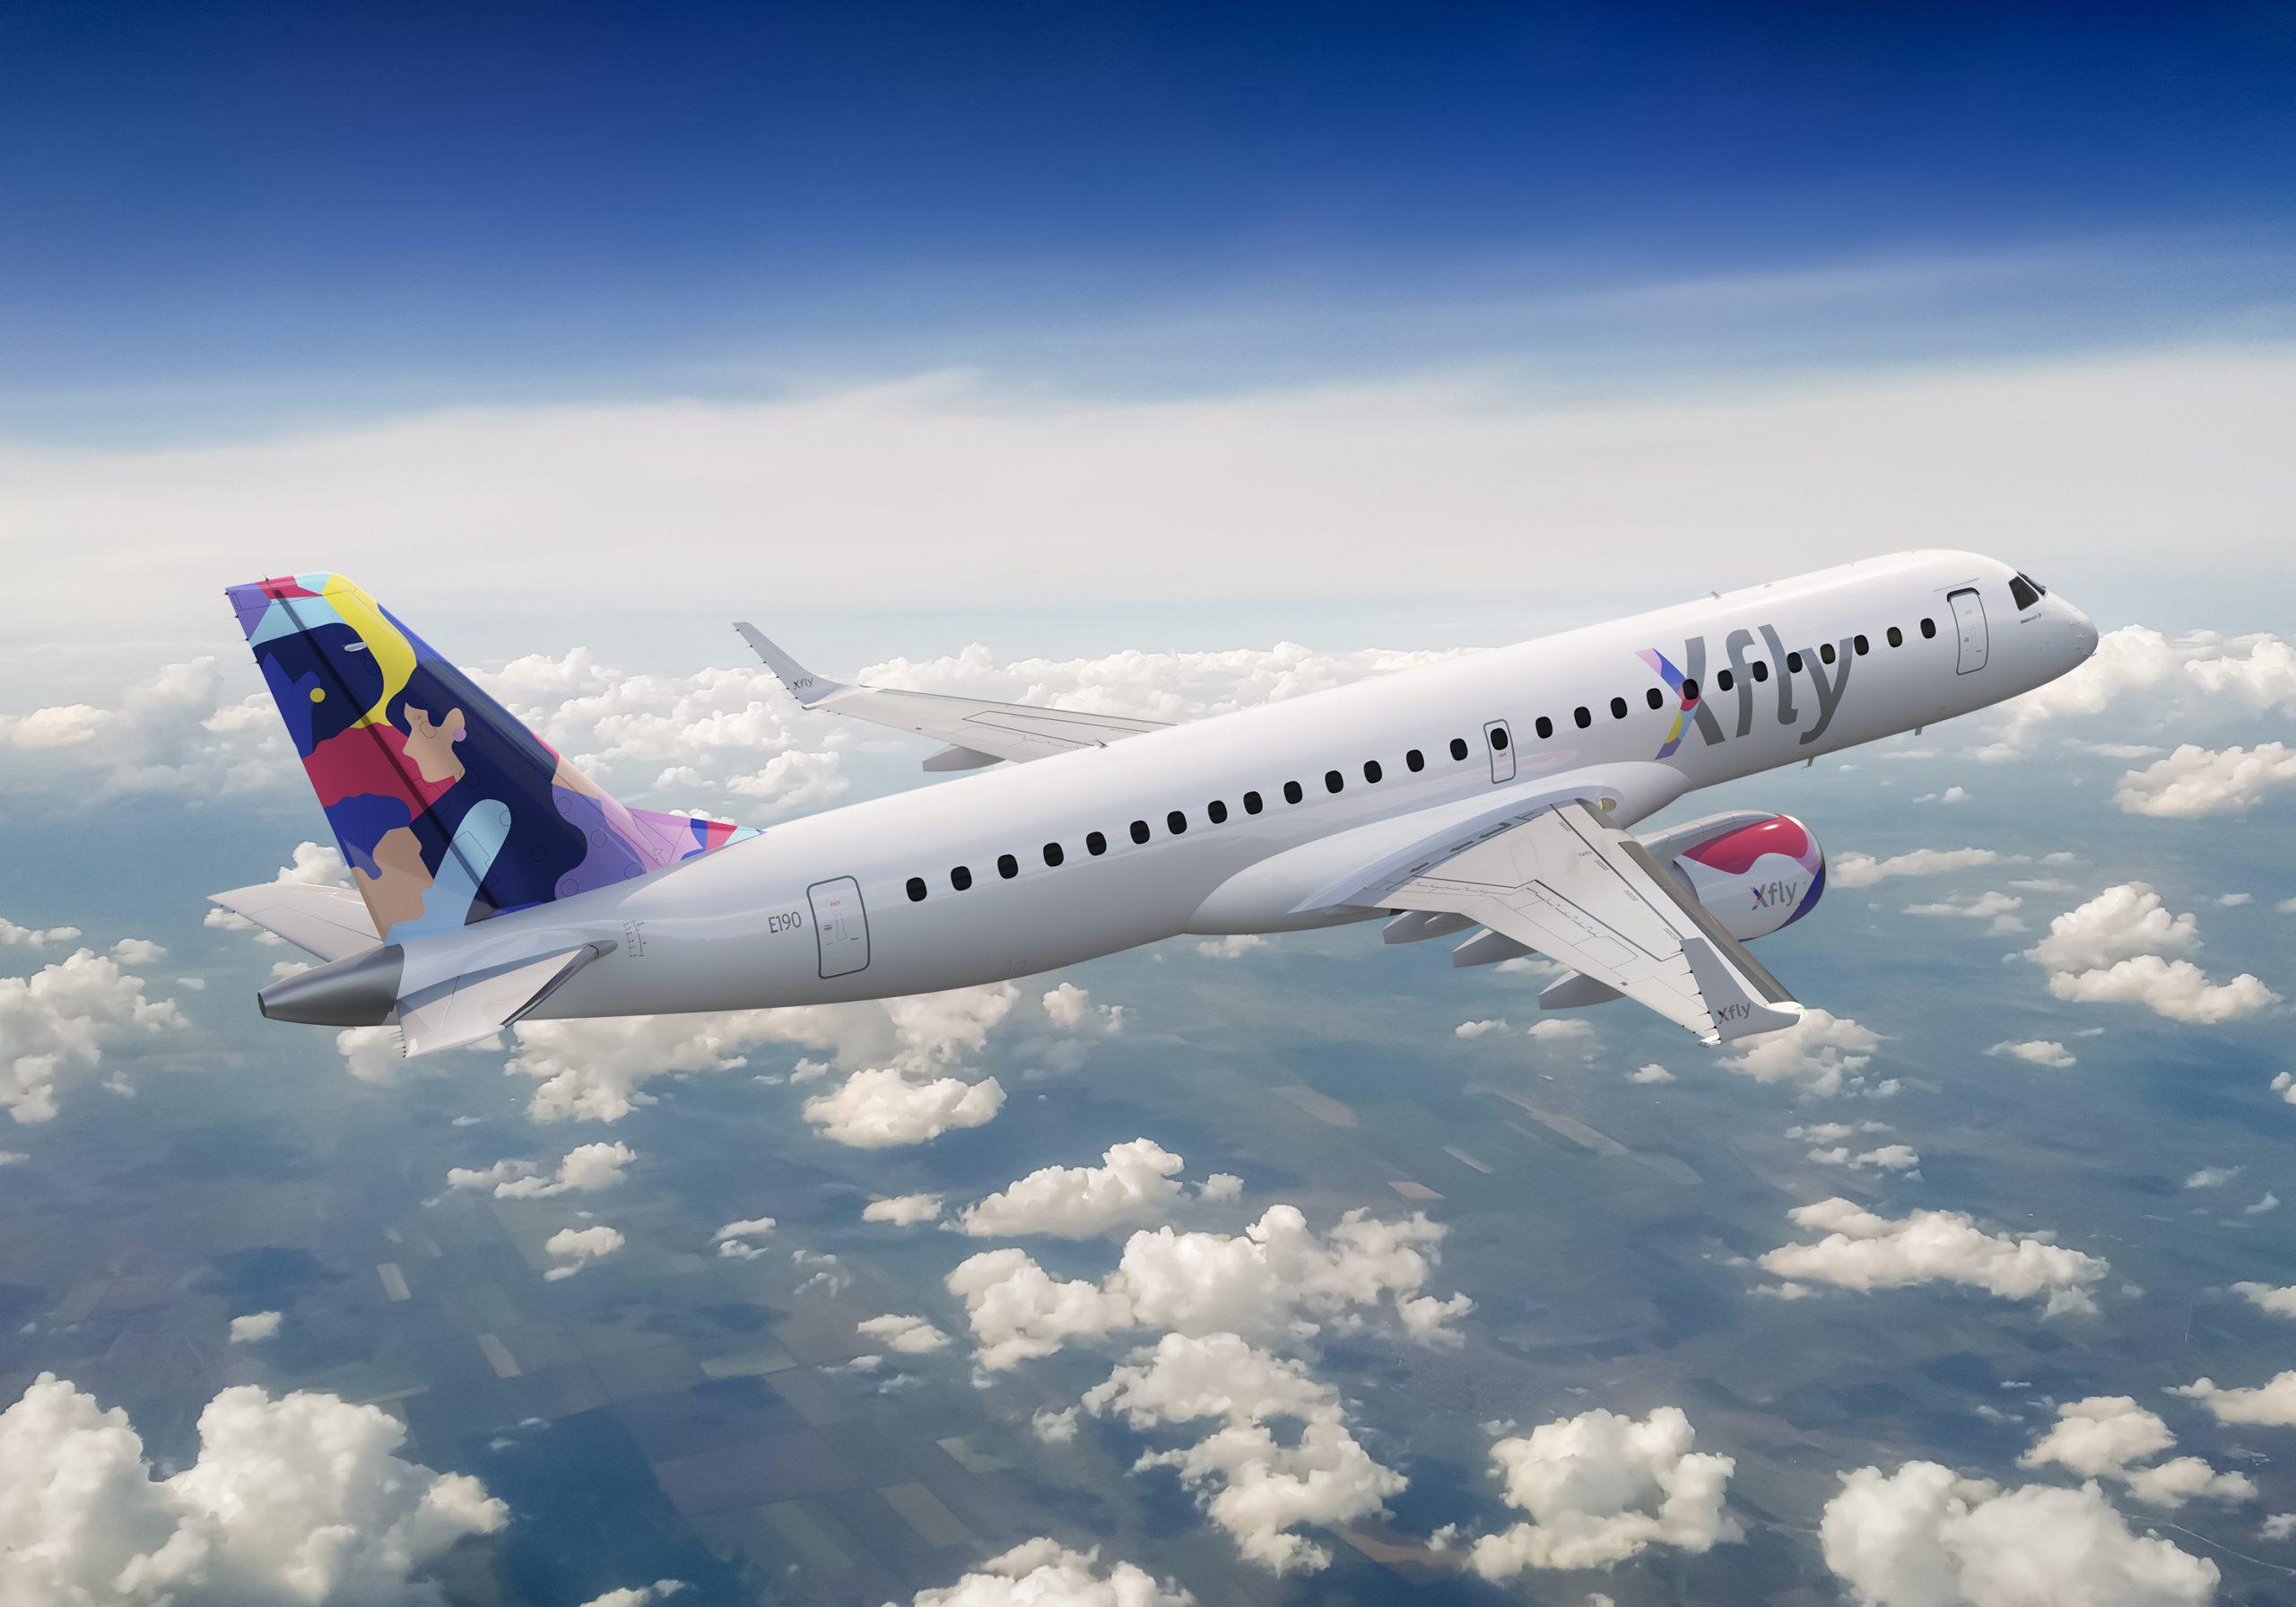 Embraer E-190 i  Xfly-farver. (Fotoillustration | Xfly)